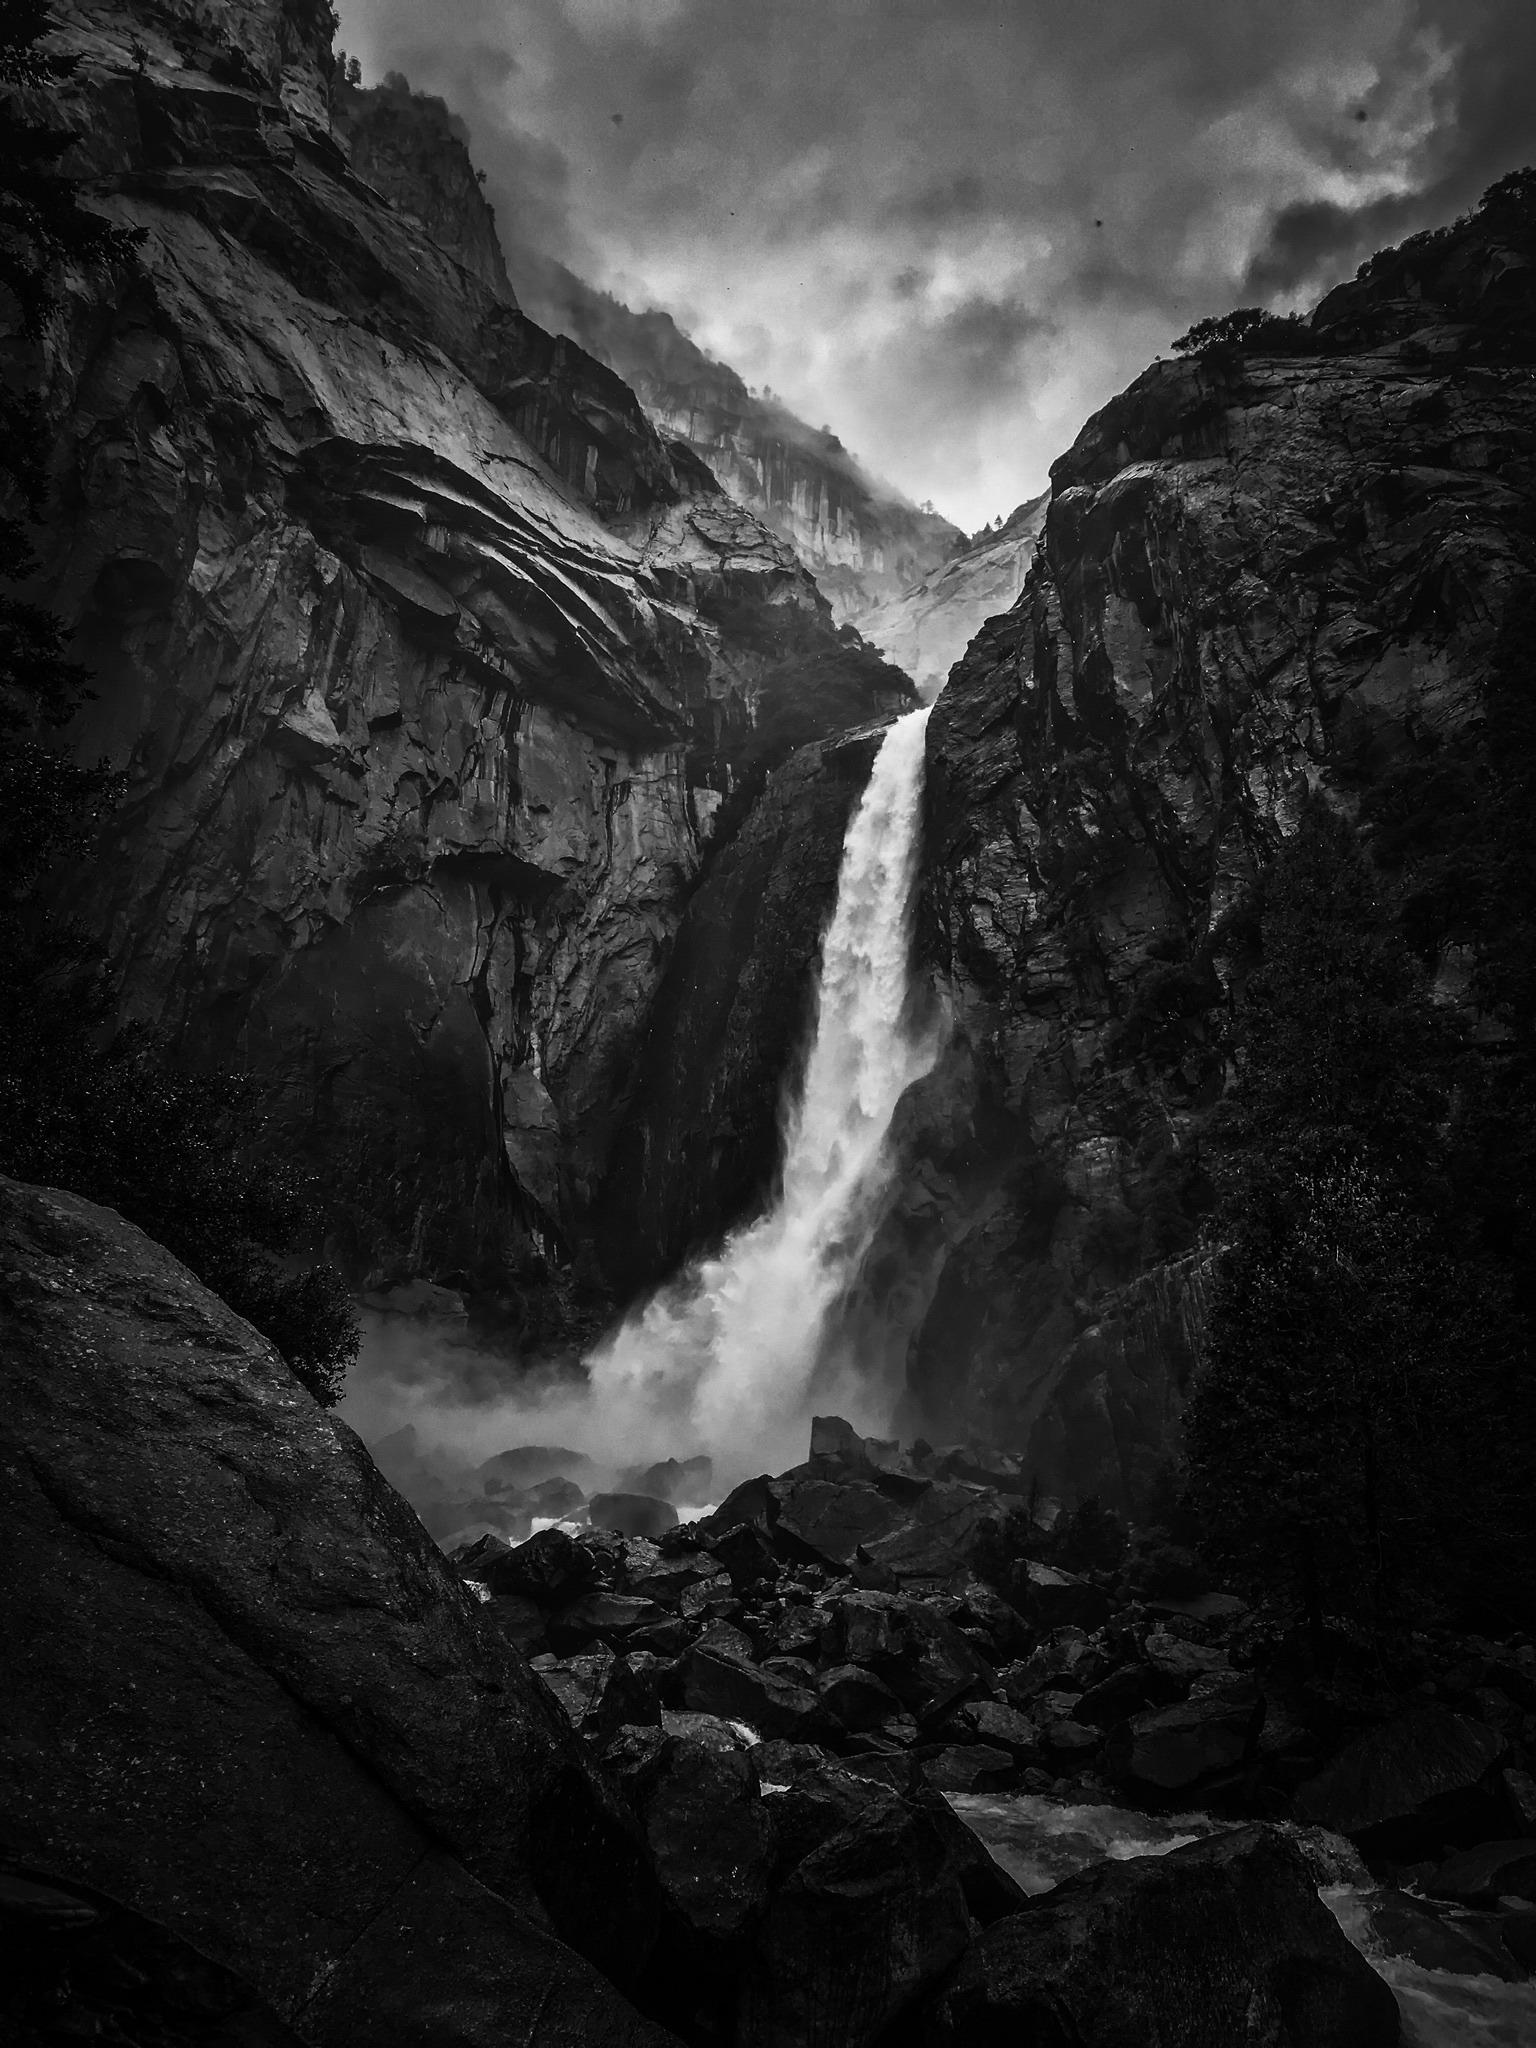 Lower Yosemite Fall. Photo: Felicia Avendano